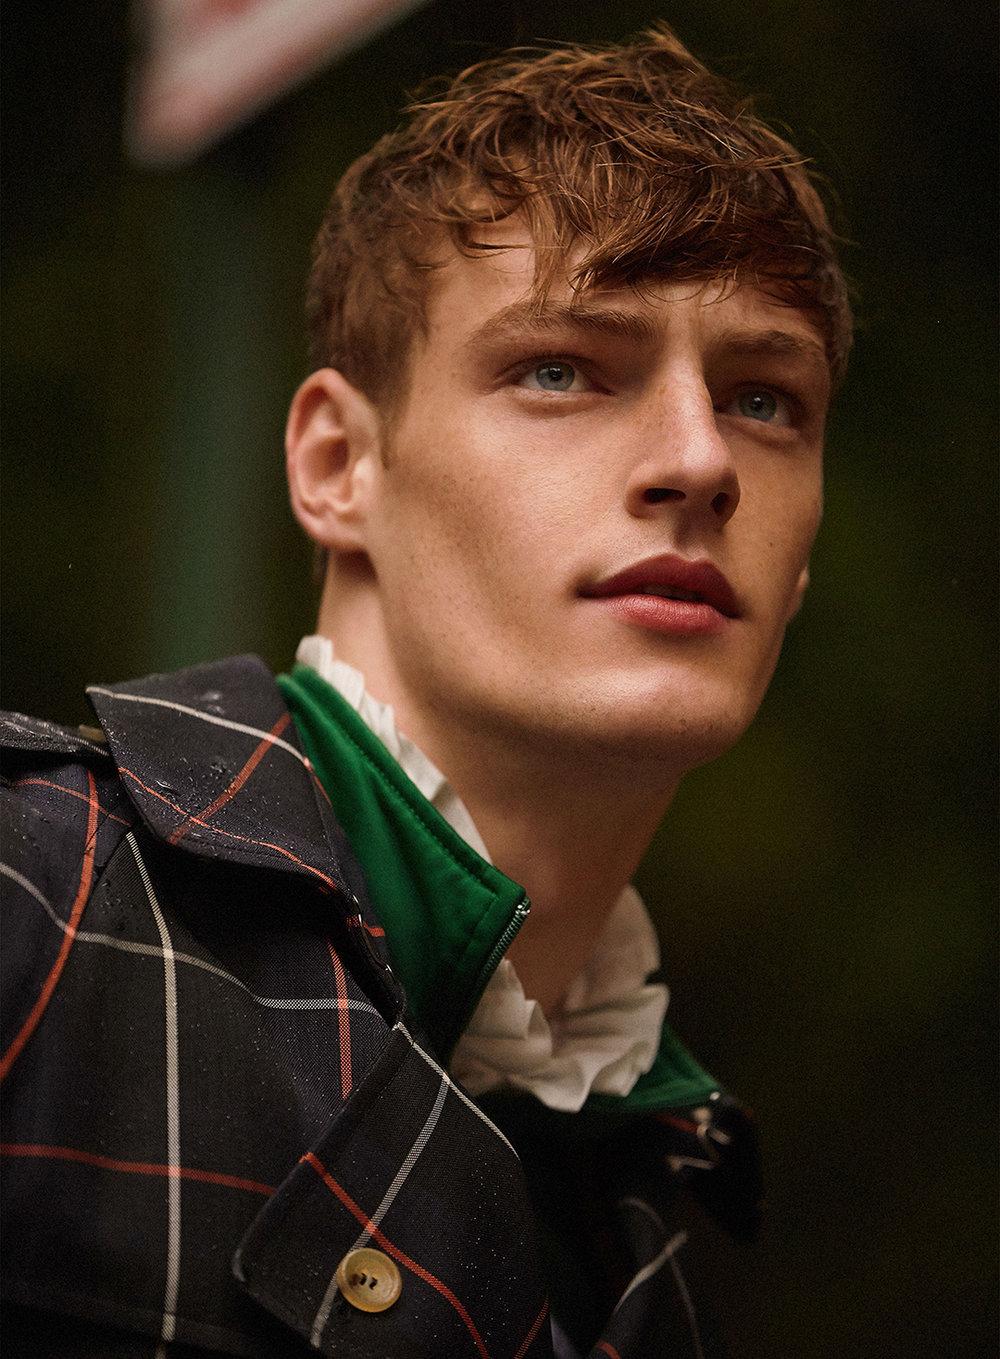 VIEW MORE - DILUVIO DE TARTAN | Styling Angelo DeSanto | Grooming Ty Shearn | Casting Bert Martirosyan | Model Roberto Sipos